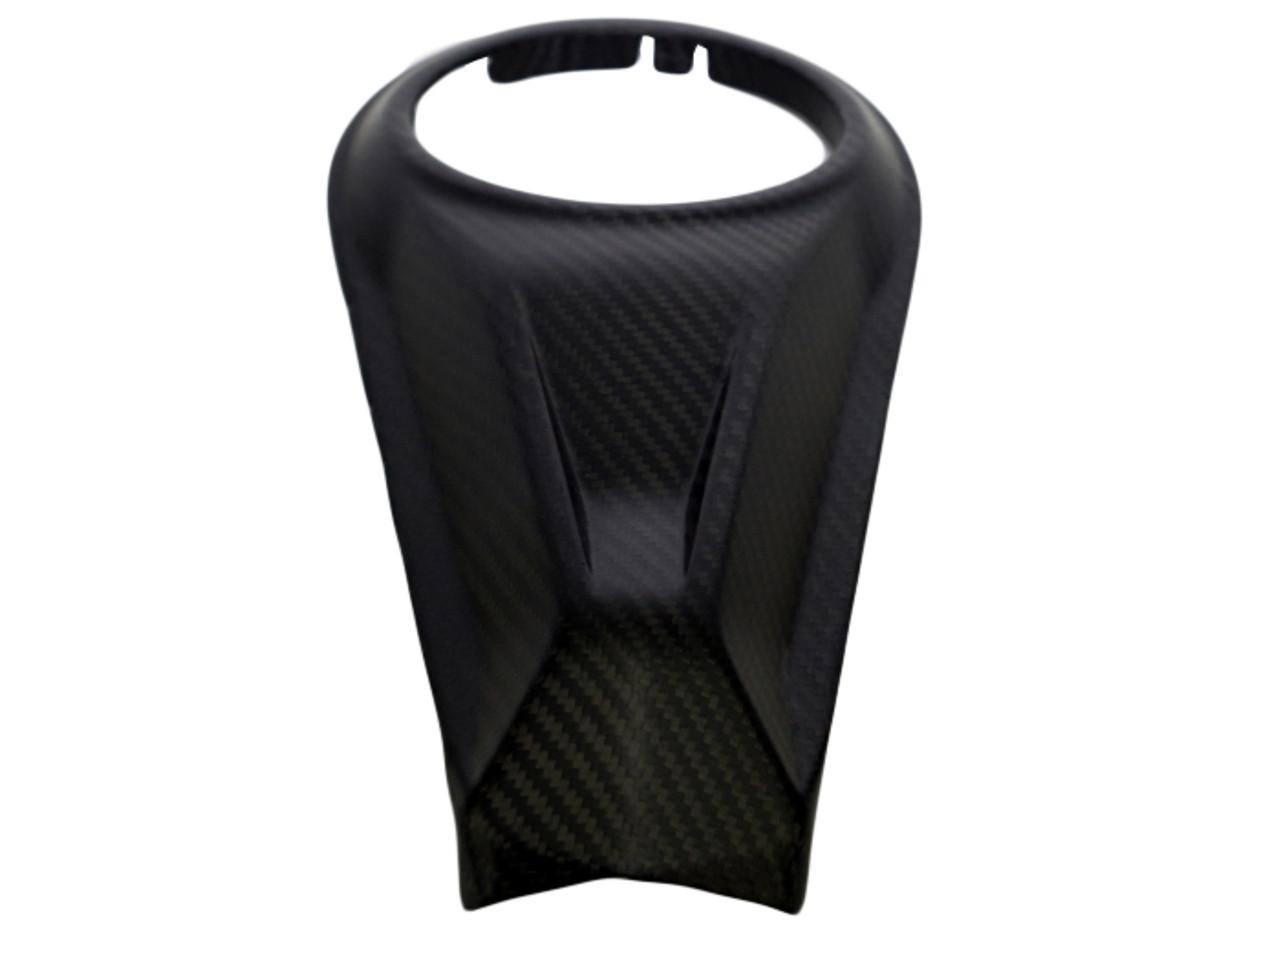 Tank Cover in Matte Twill Weave Carbon Fiber for KTM 1290 Super Duke R 2017+